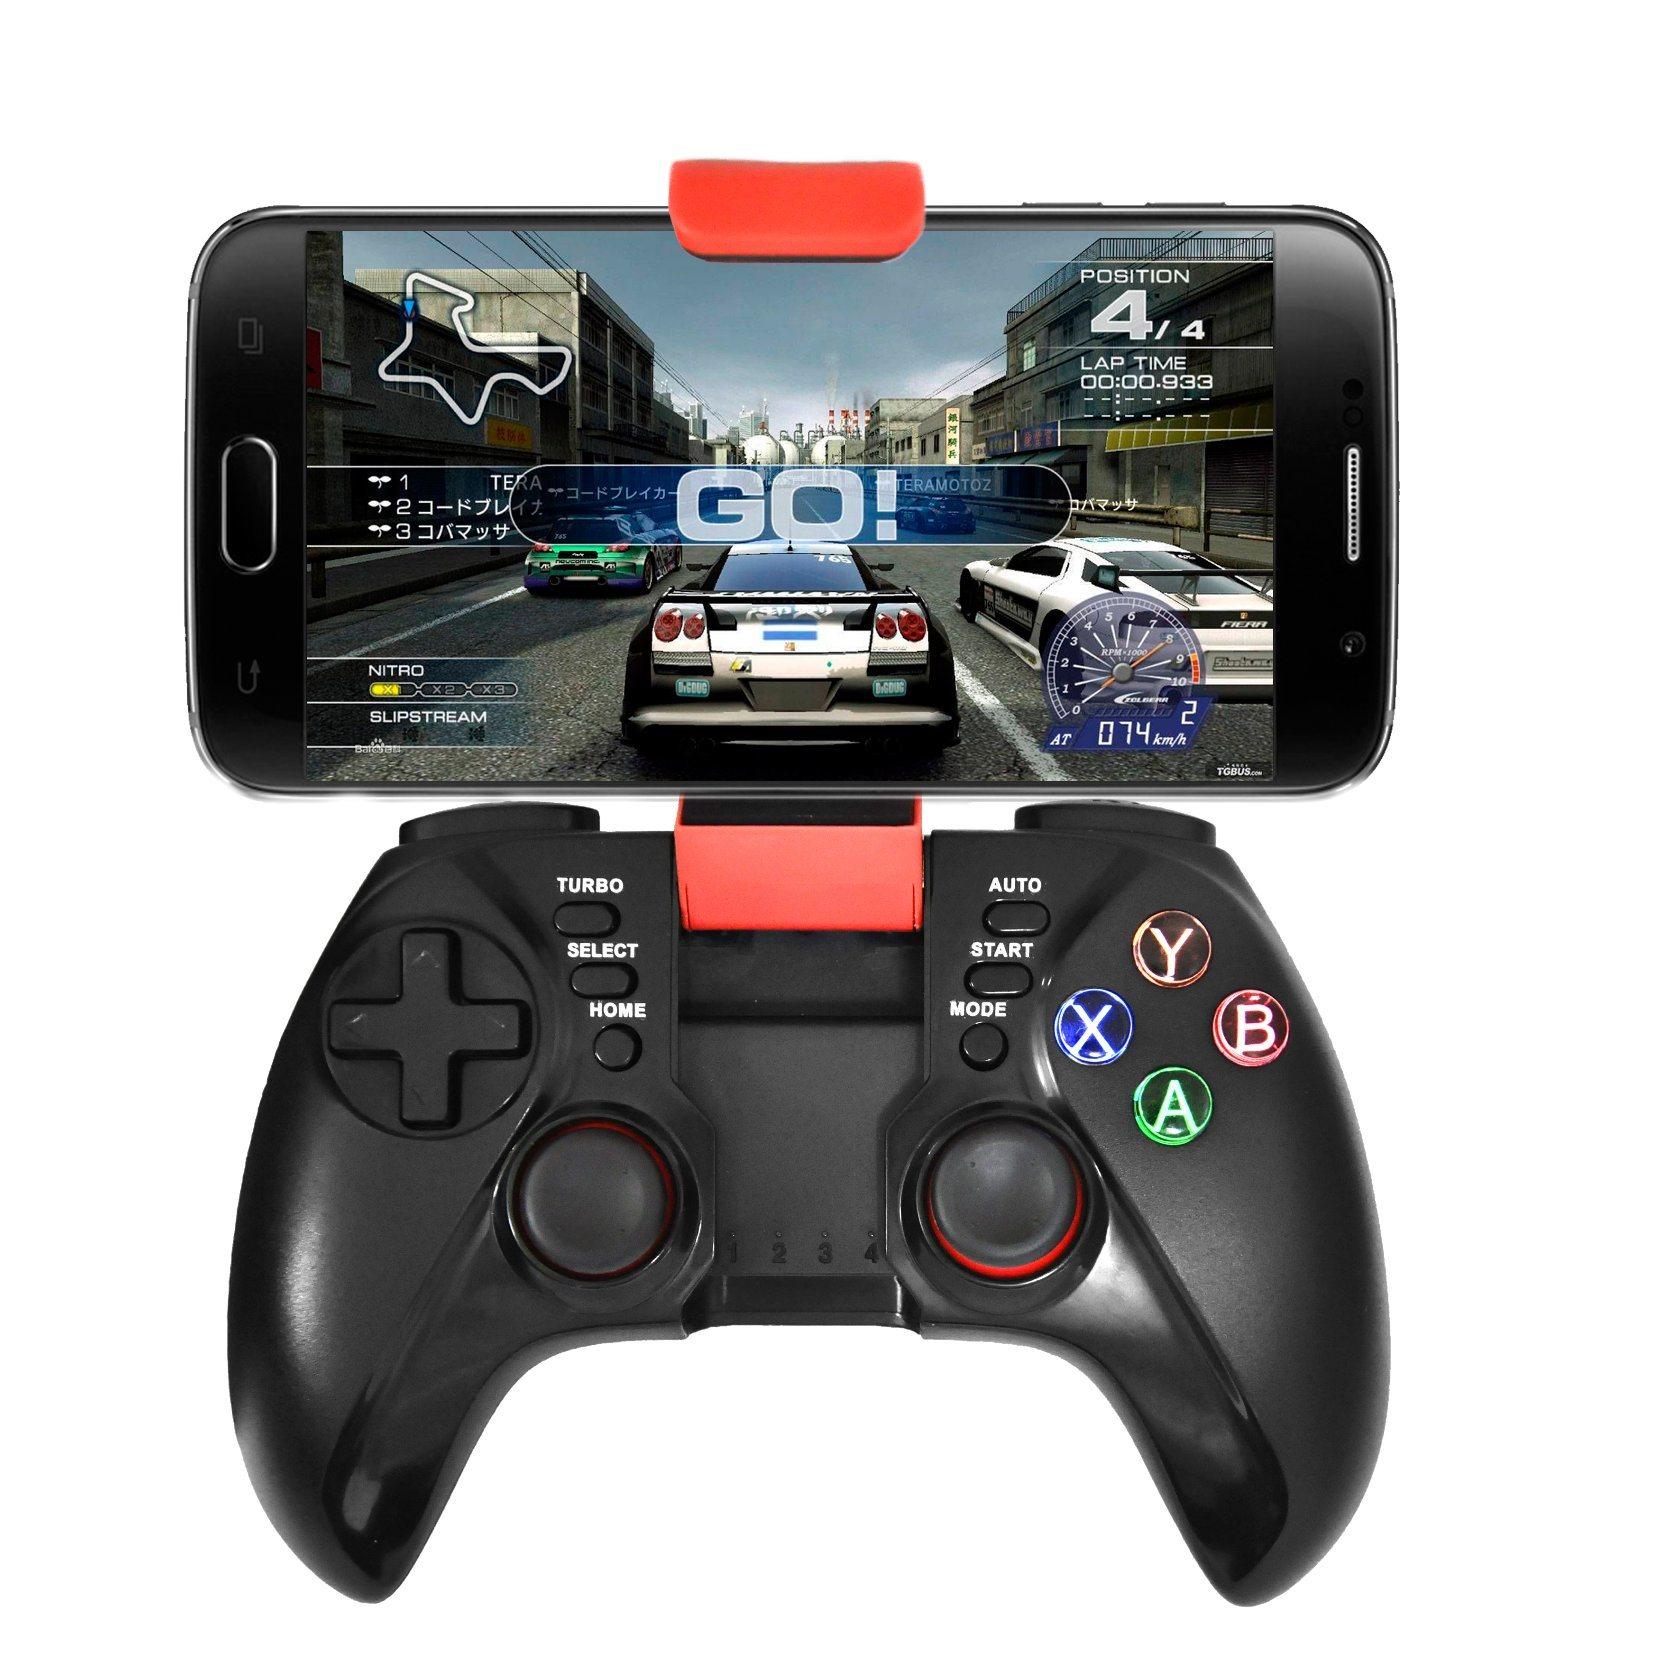 Bluetooth Android/Ios Gamepad